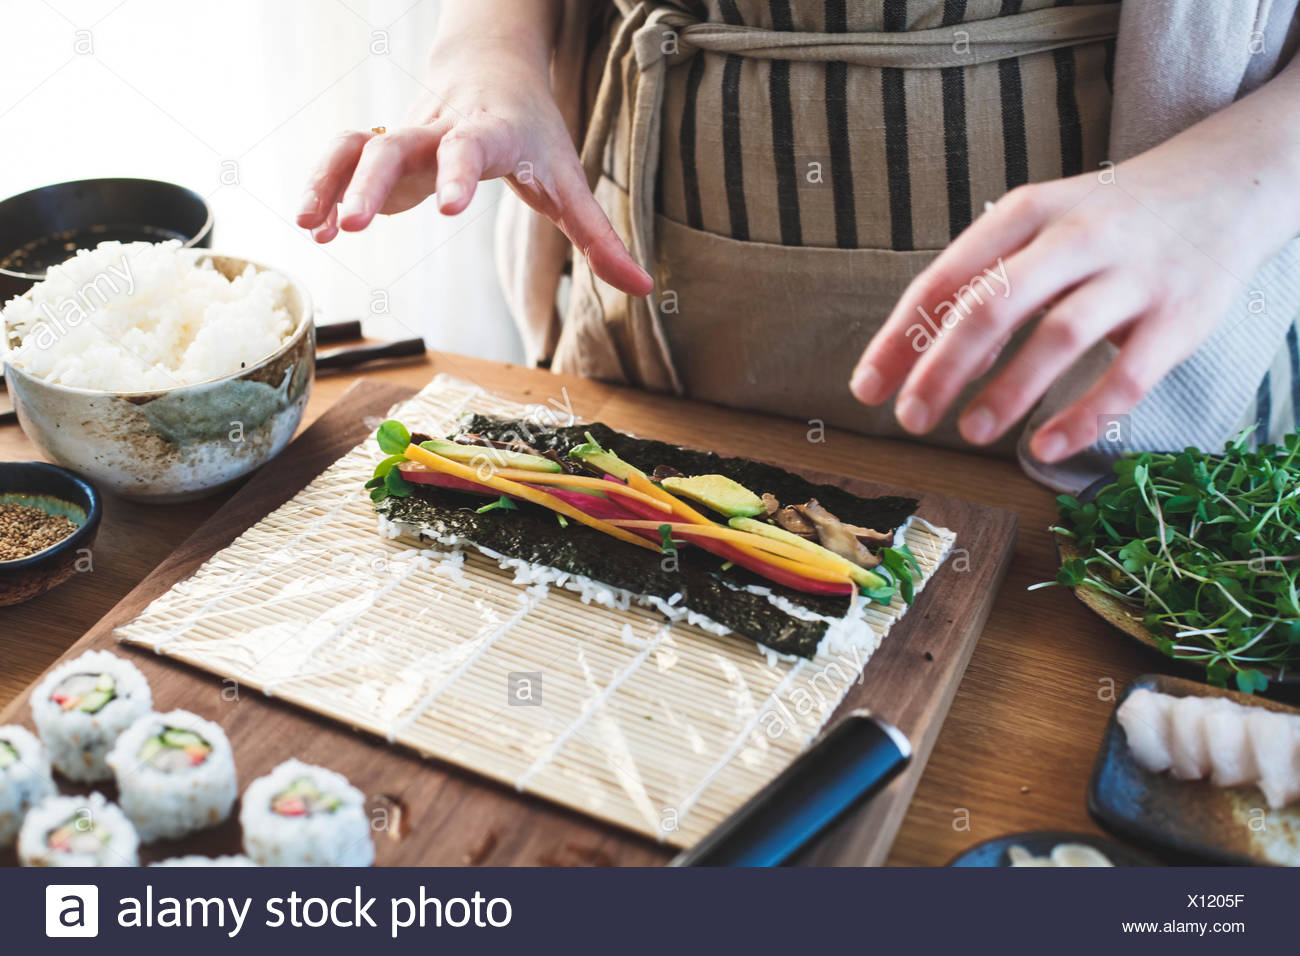 The making of sushi. Rolled sushi preparation. - Stock Image